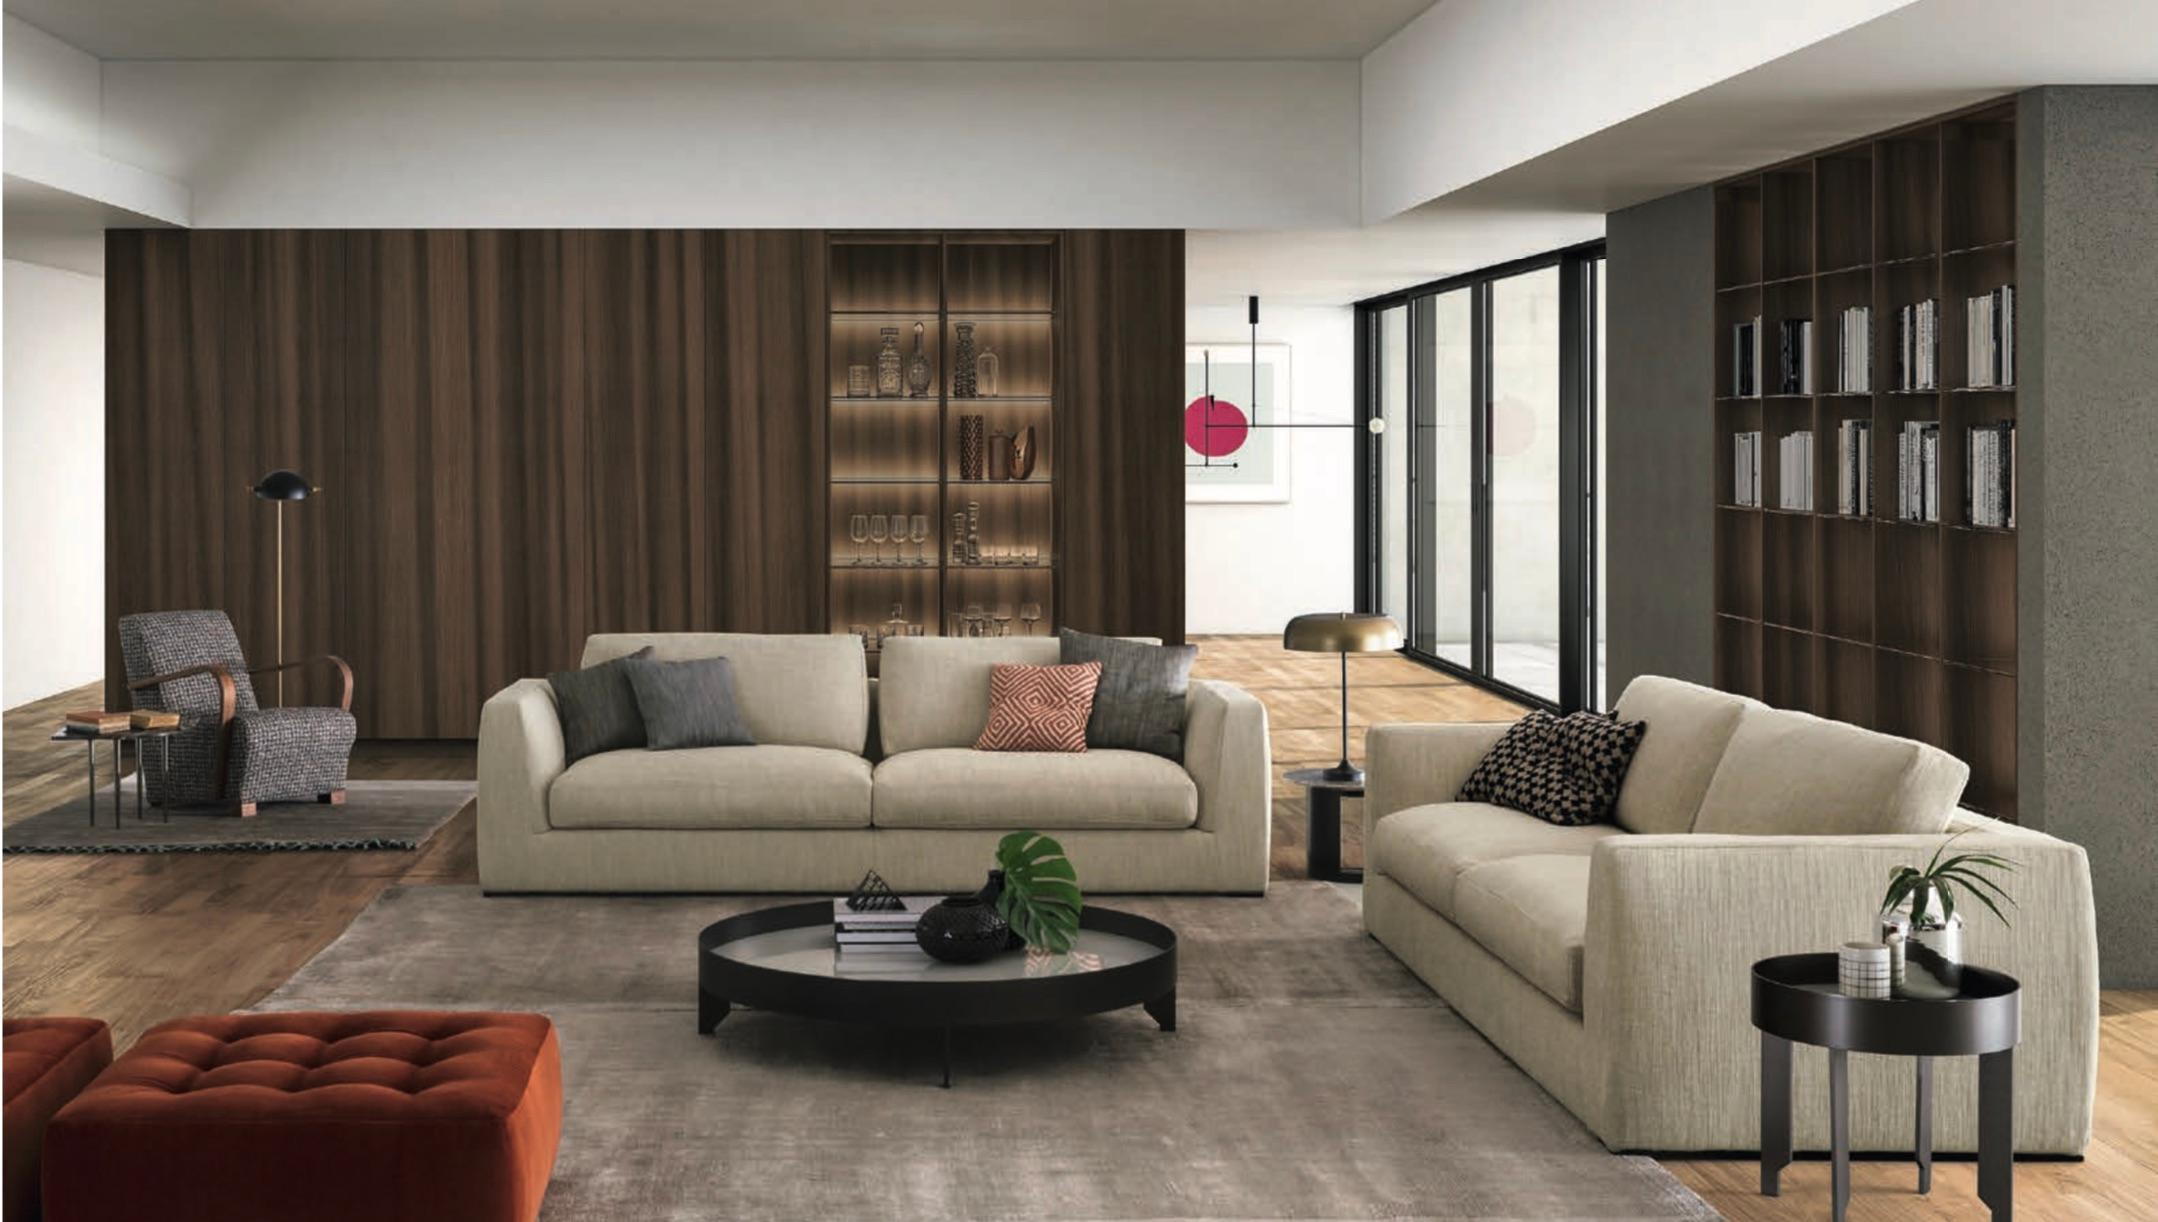 Italian Modern Lond Sofa, Made in Italy, Contemporary Design